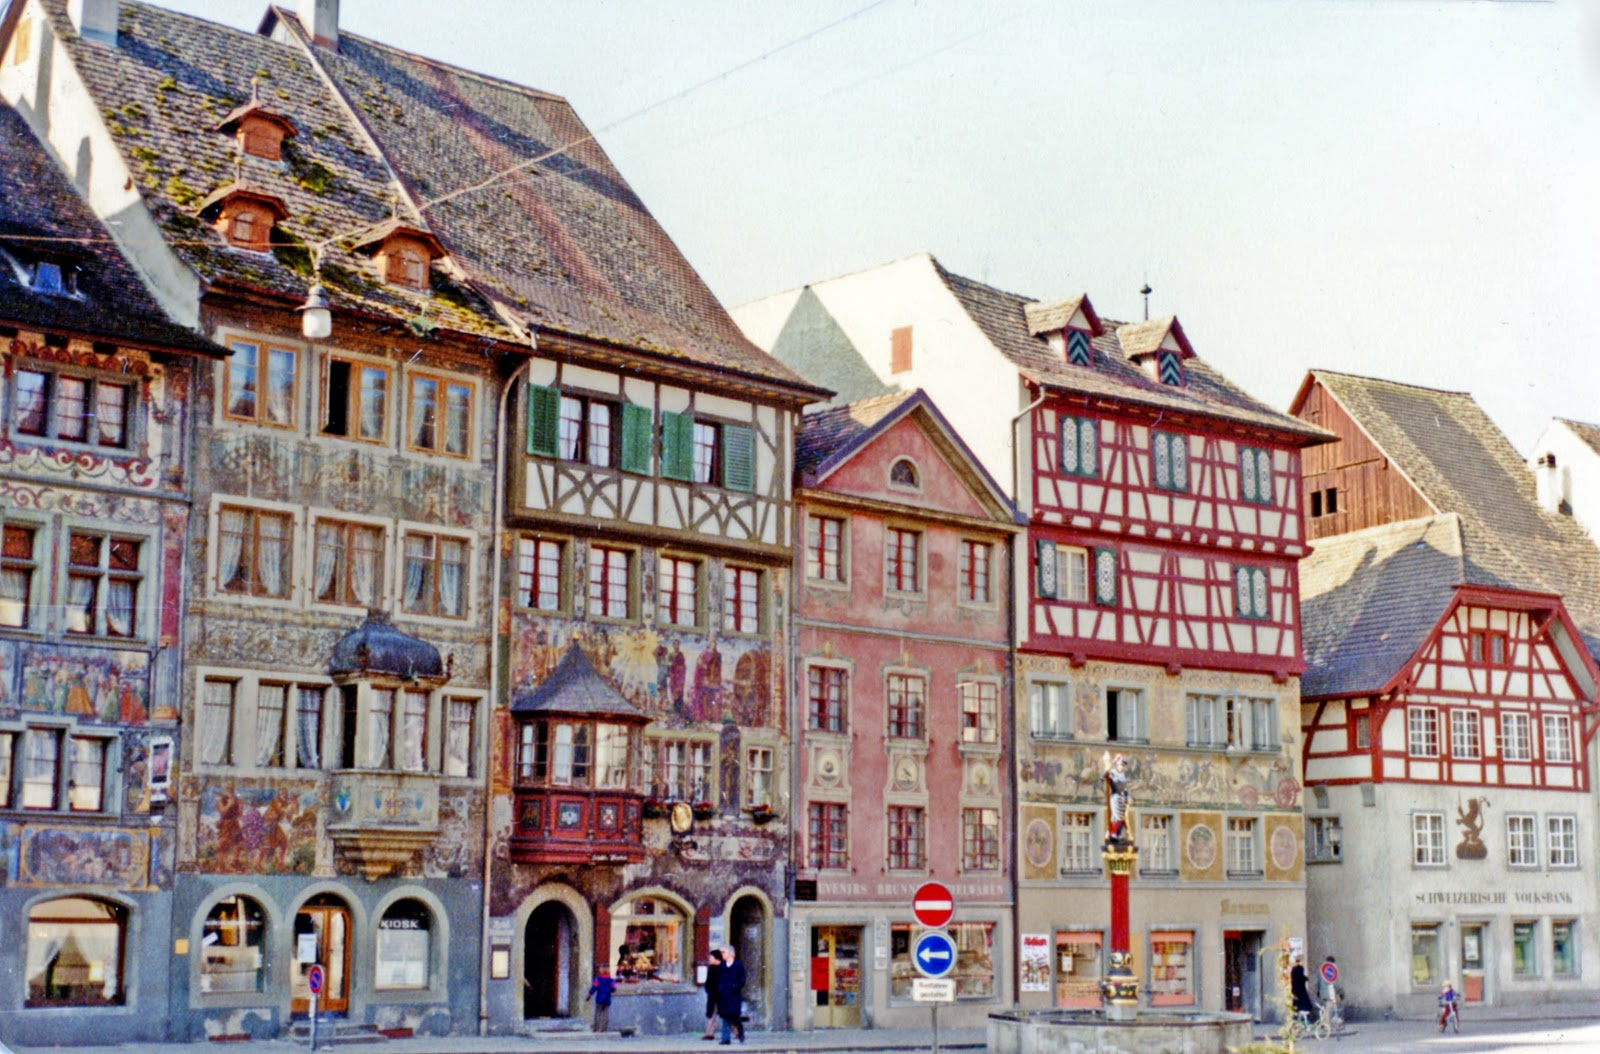 Rathausplatz Buildings With Painted Façades